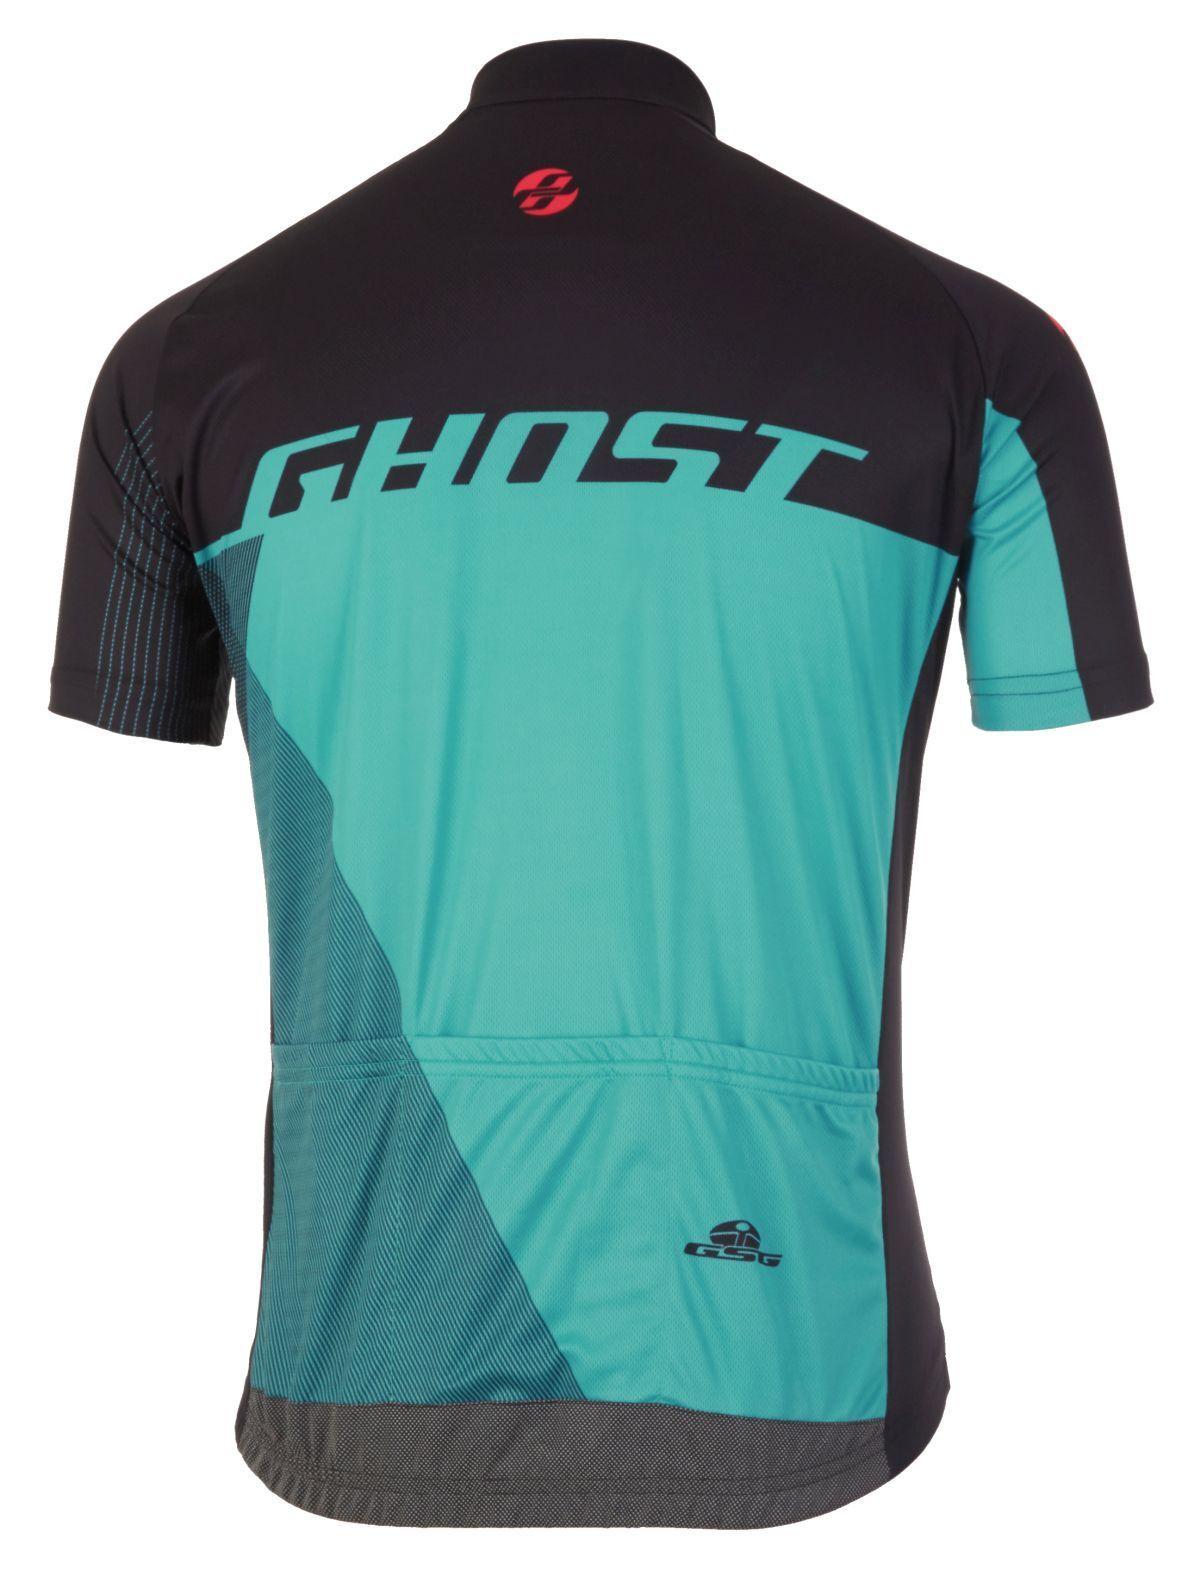 Ghost Performance Evo Jersey Short, Short, Jersey schwarz-blau-blau, Größe XS, Fahrrad-Trikot d96669